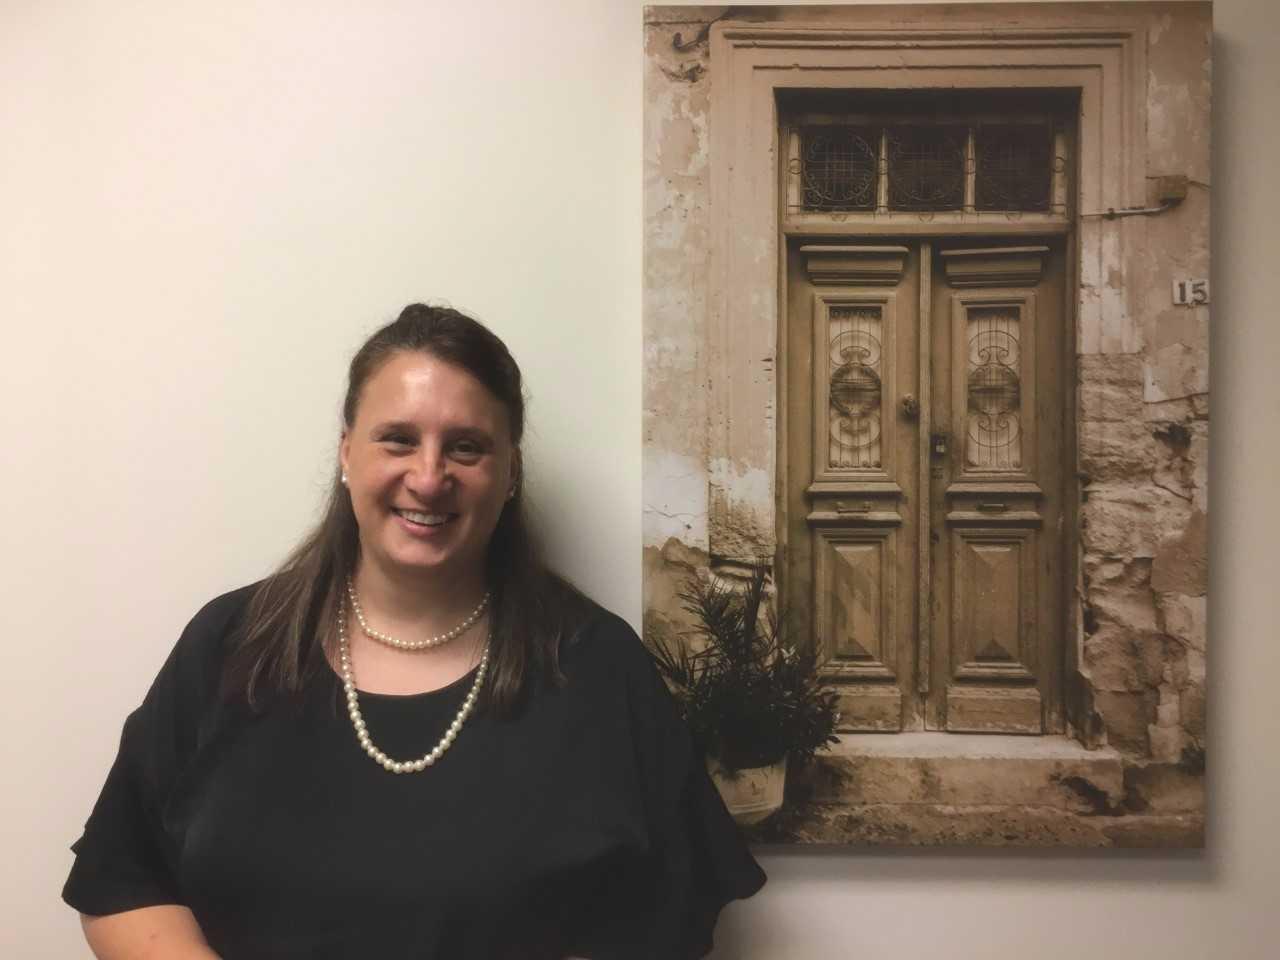 LisaMarie+Malischke%2C+Ph.D.%2C+is+a+new+assistant+professor.